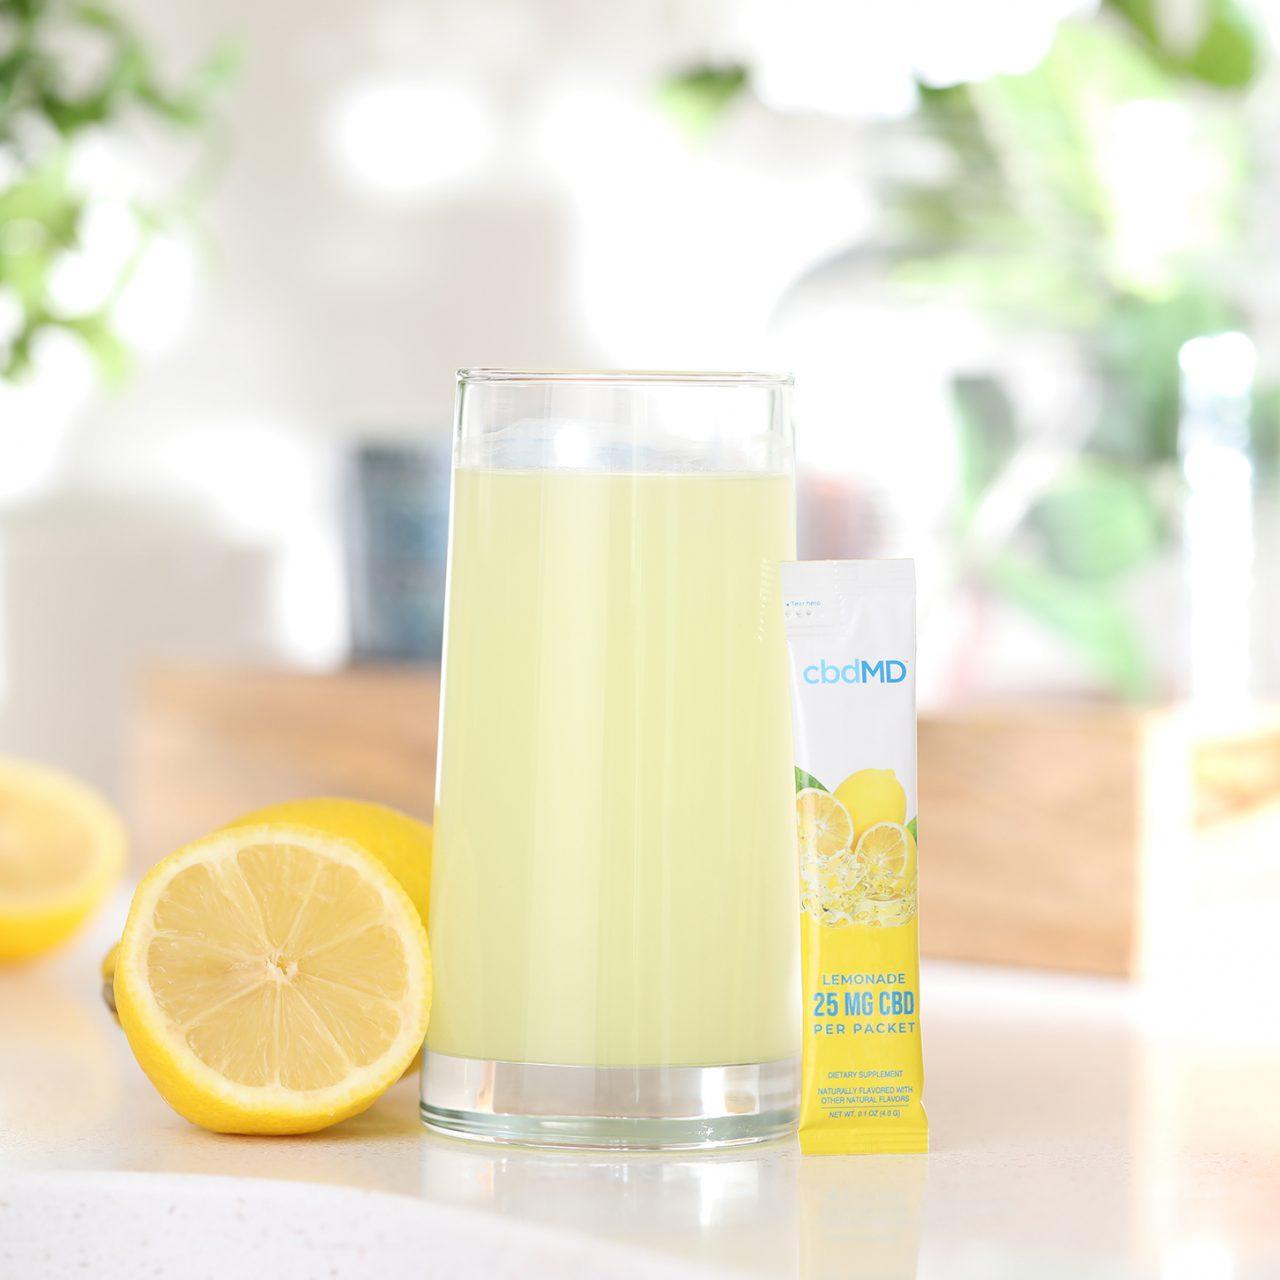 cbdMD, CBD Powdered Drink Mix, Broad Spectrum THC-Free, Lemonade, 10ct, 250mg CBD 3